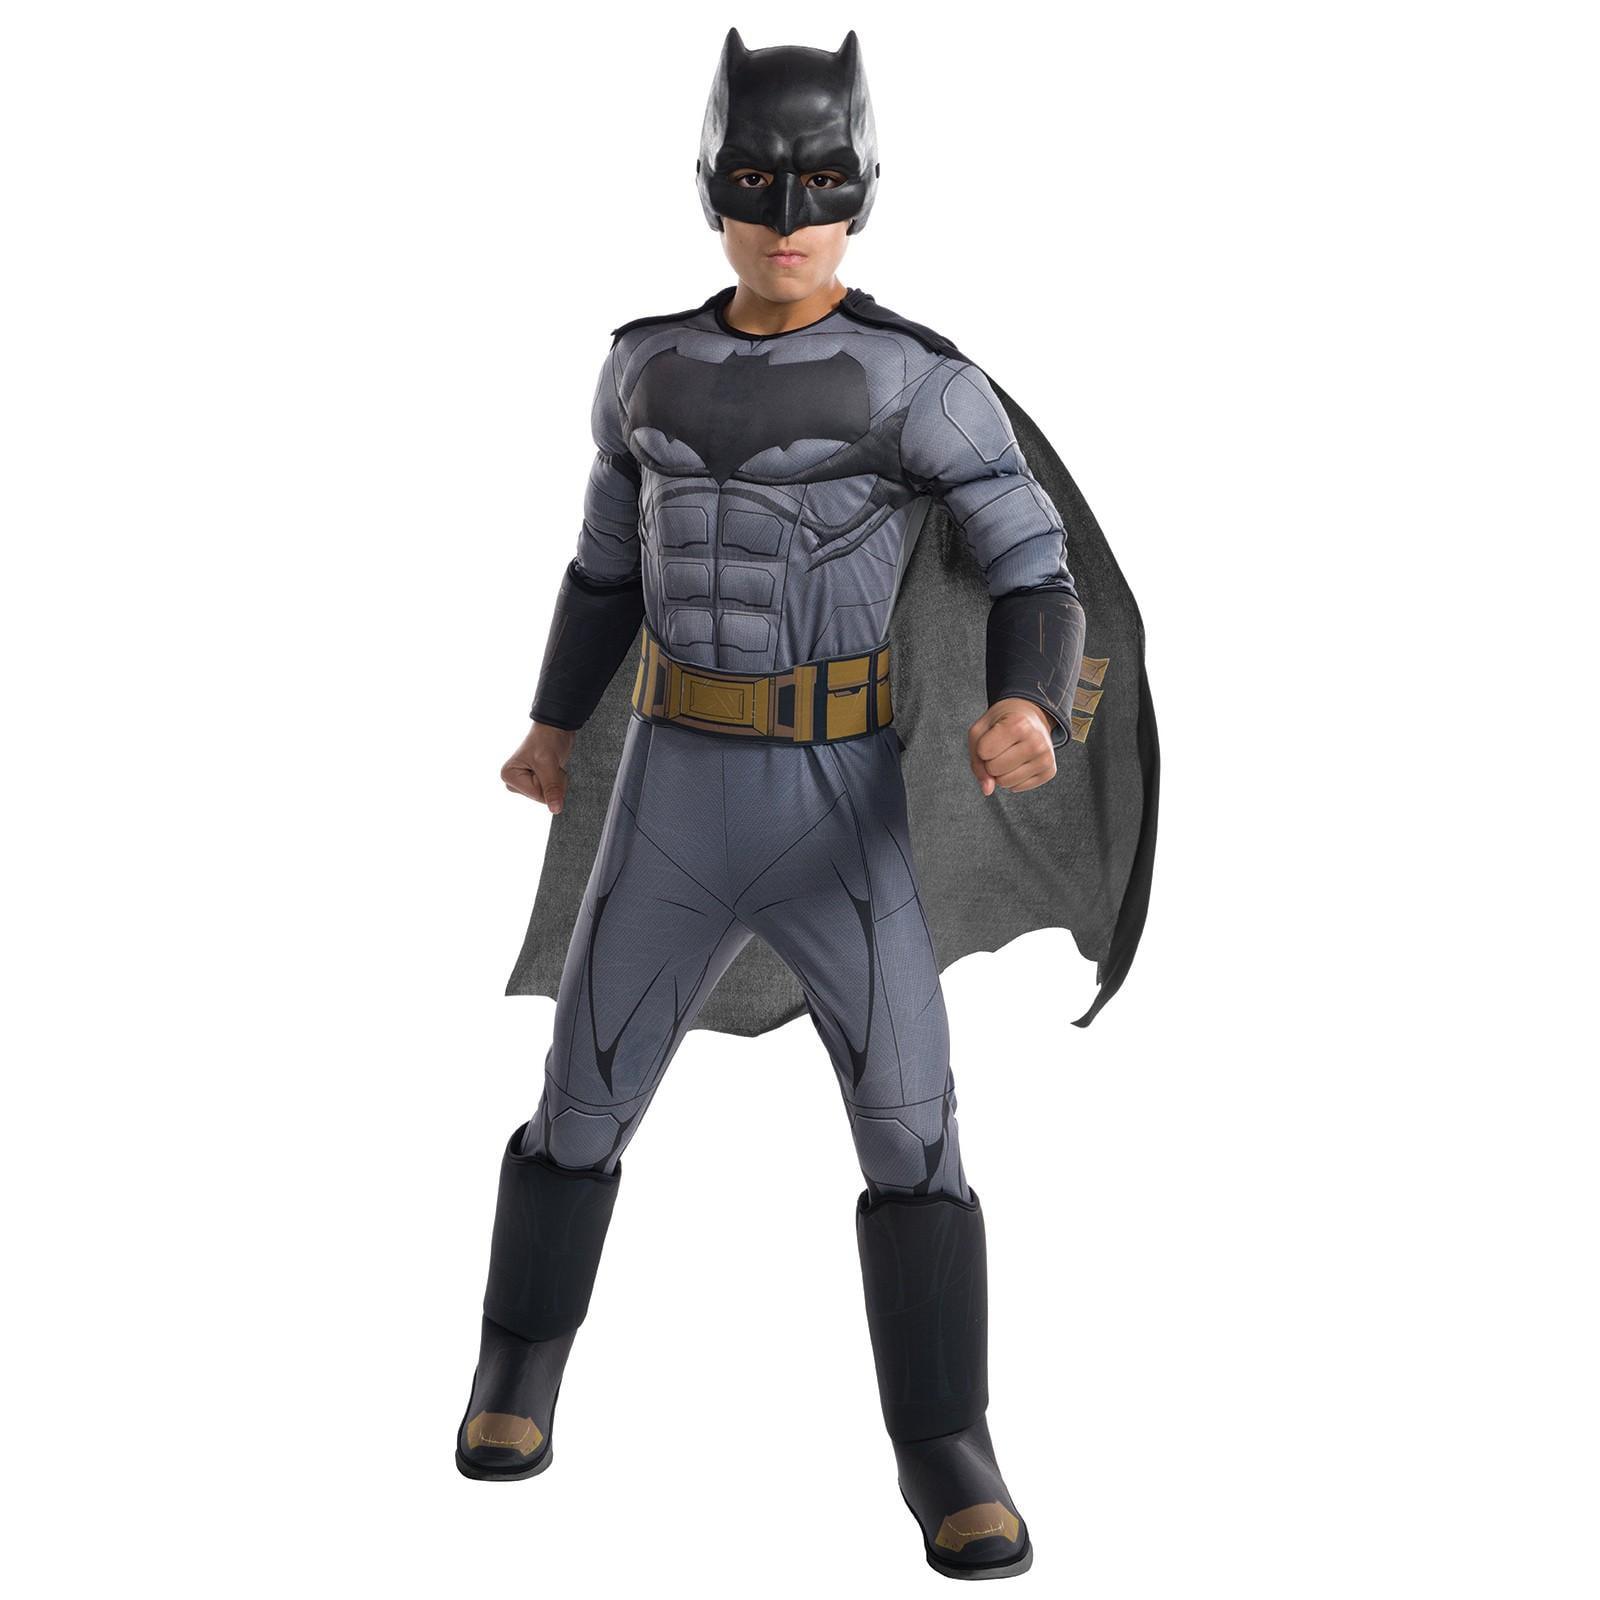 Justice League Movie - Batman Deluxe Child Costume S